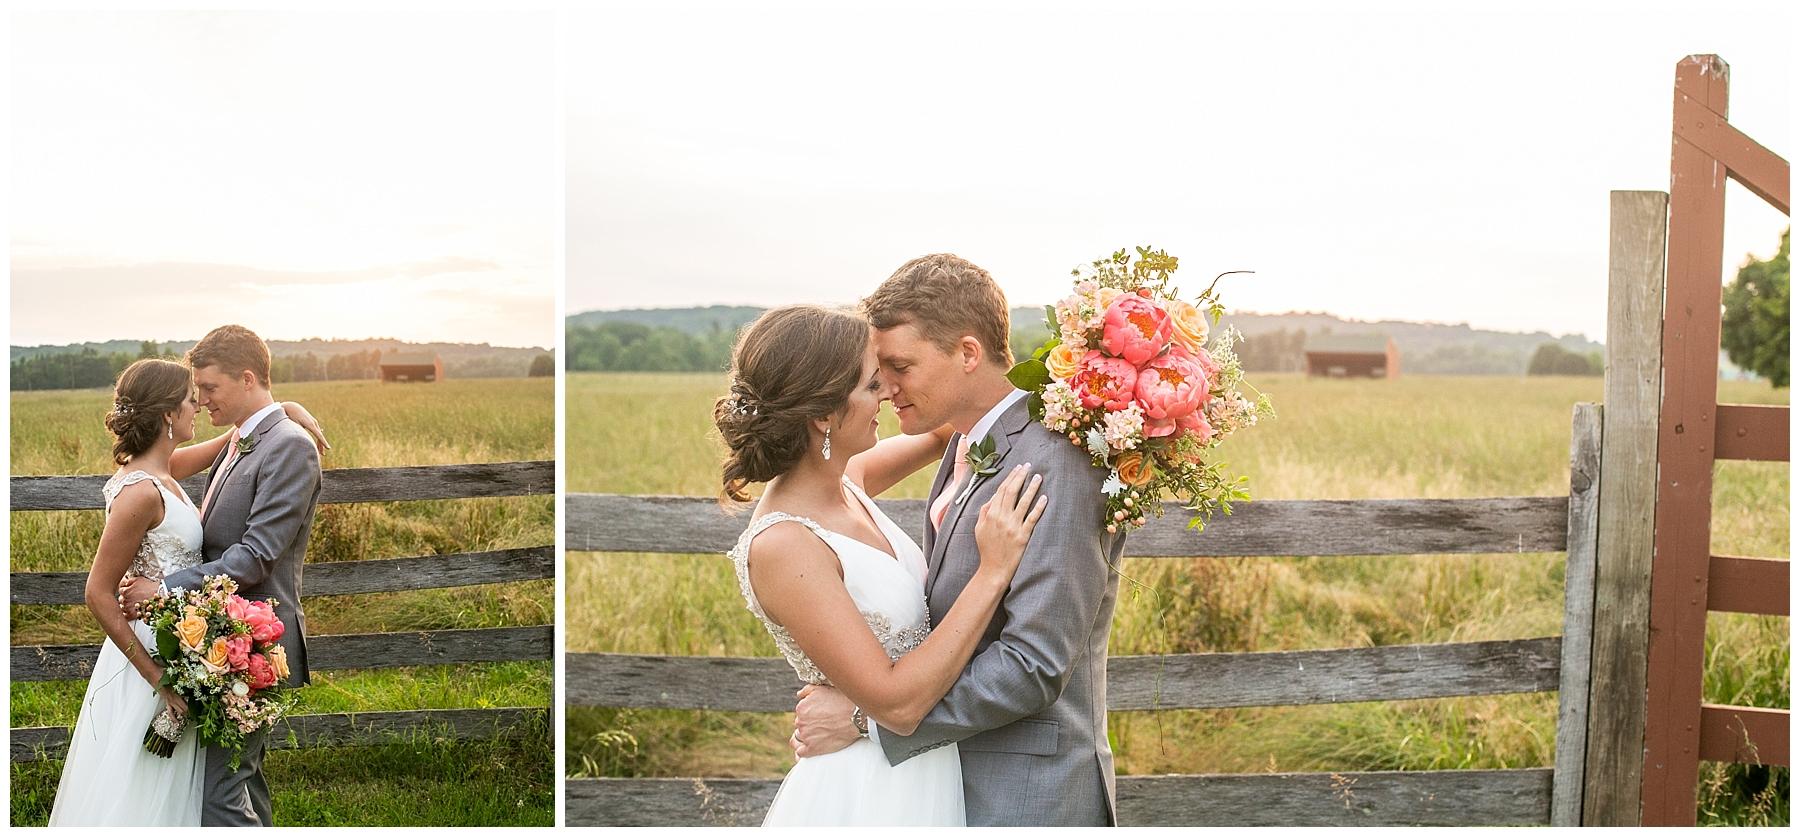 Chelsea Phil Bohemia River Overlook Wedding Living Radiant Photography photos_0179.jpg